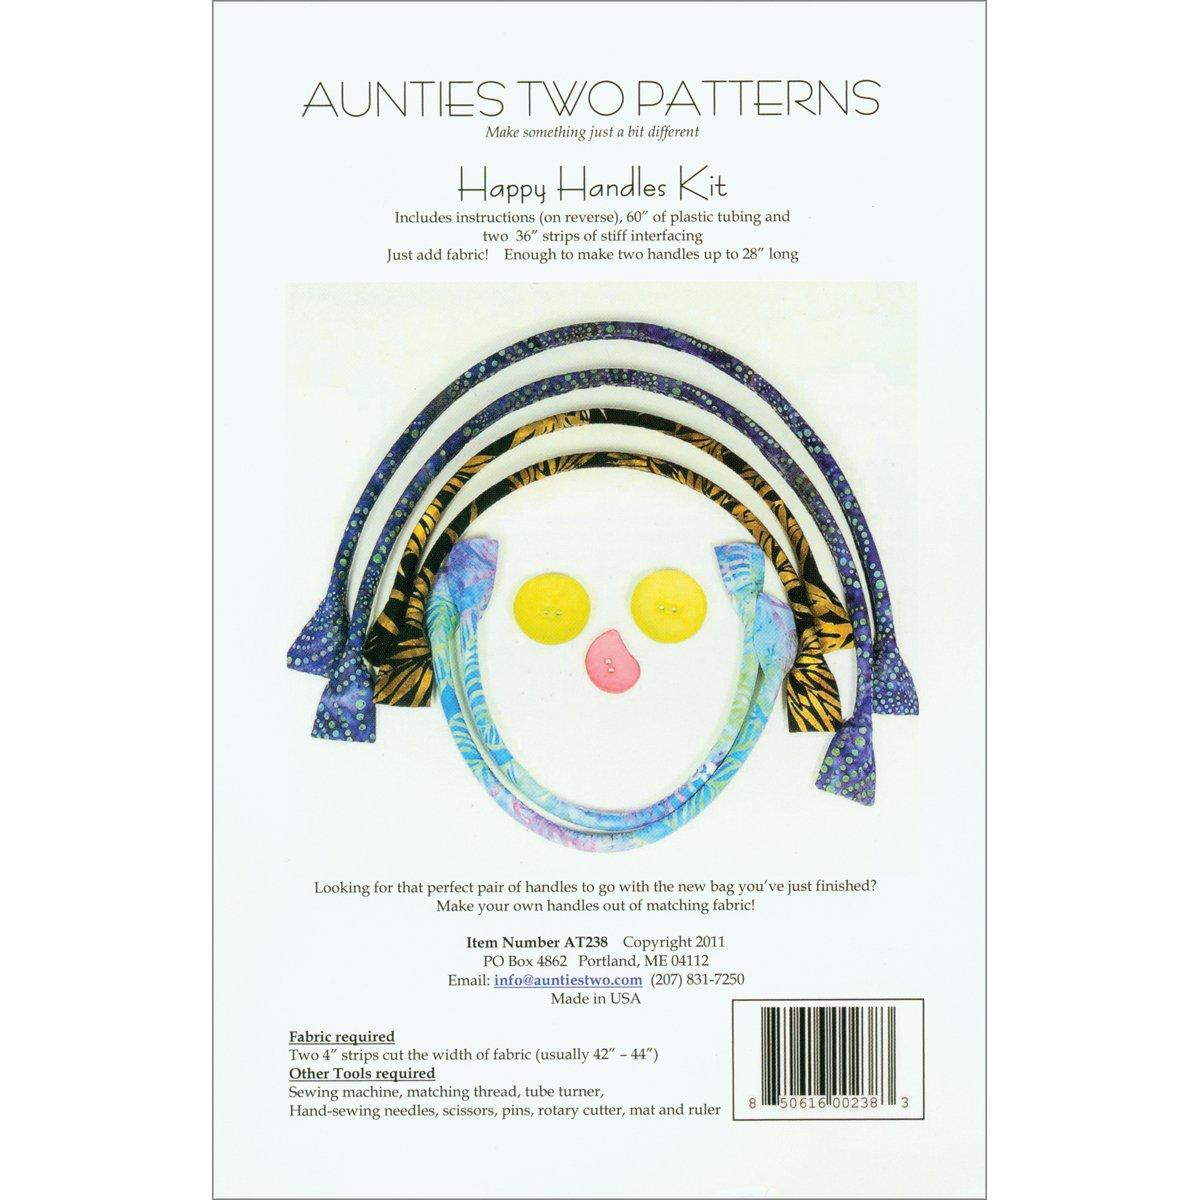 Amazon.com : Aunties Two Patterns - Happy Handles Kit : Prints ...